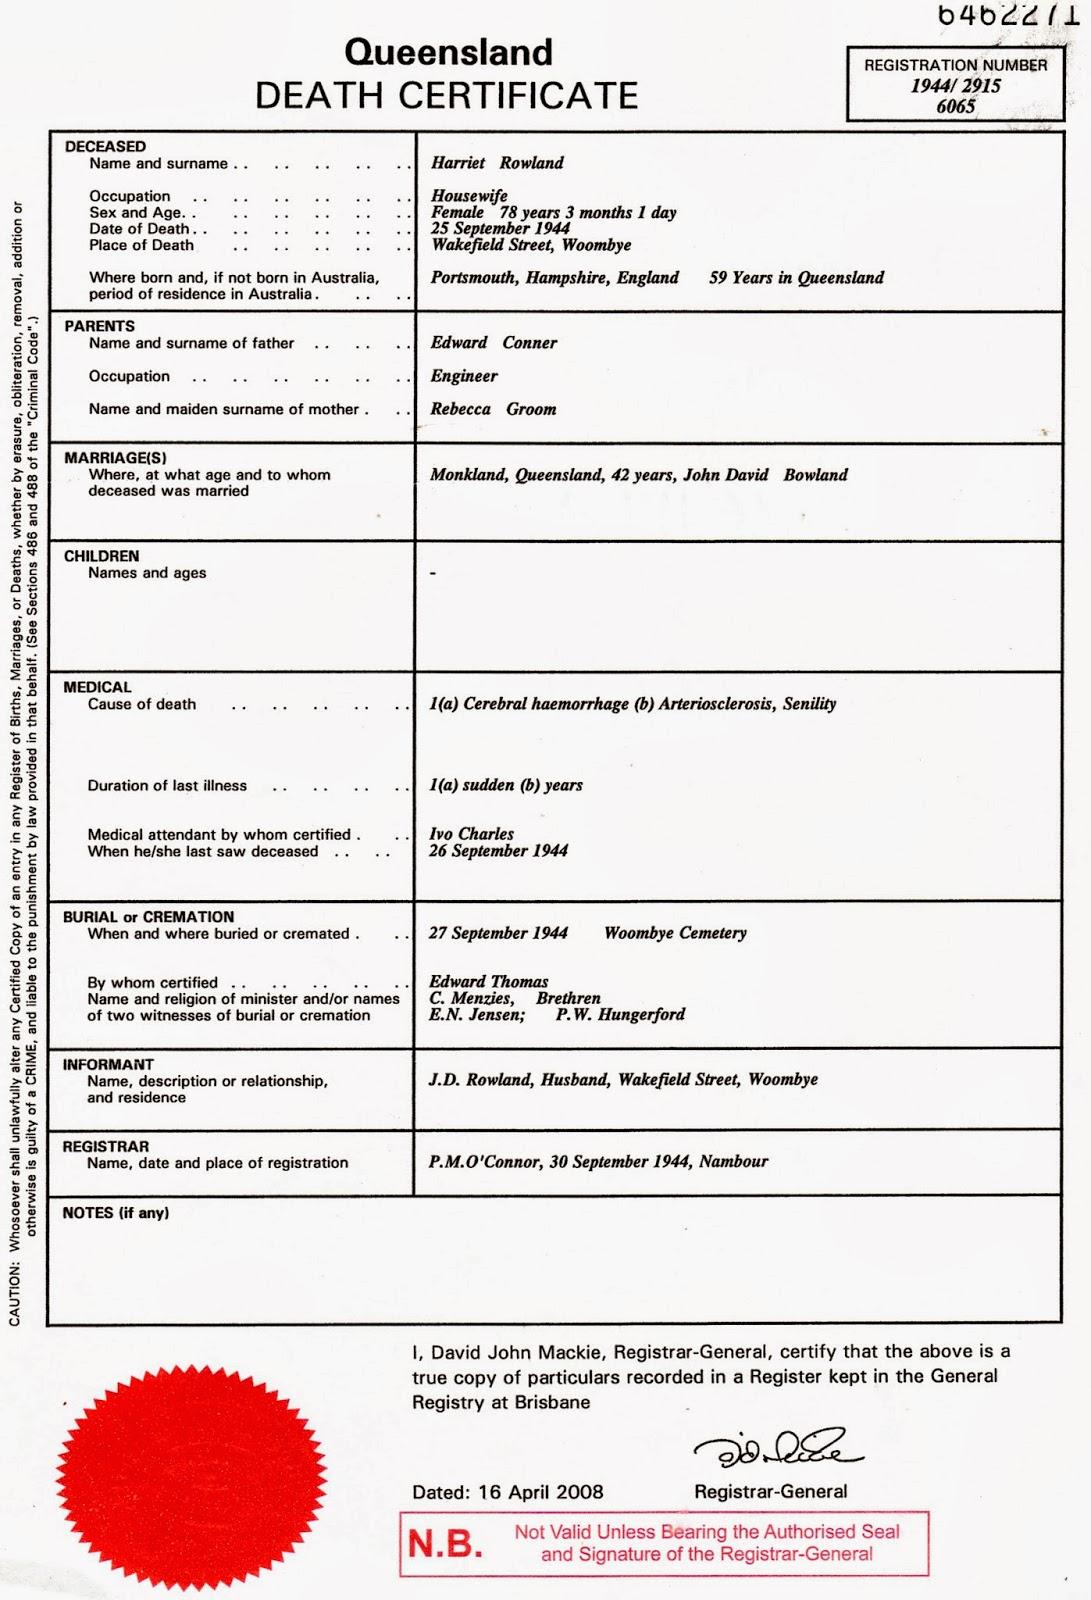 Bdm qld birth certificate application